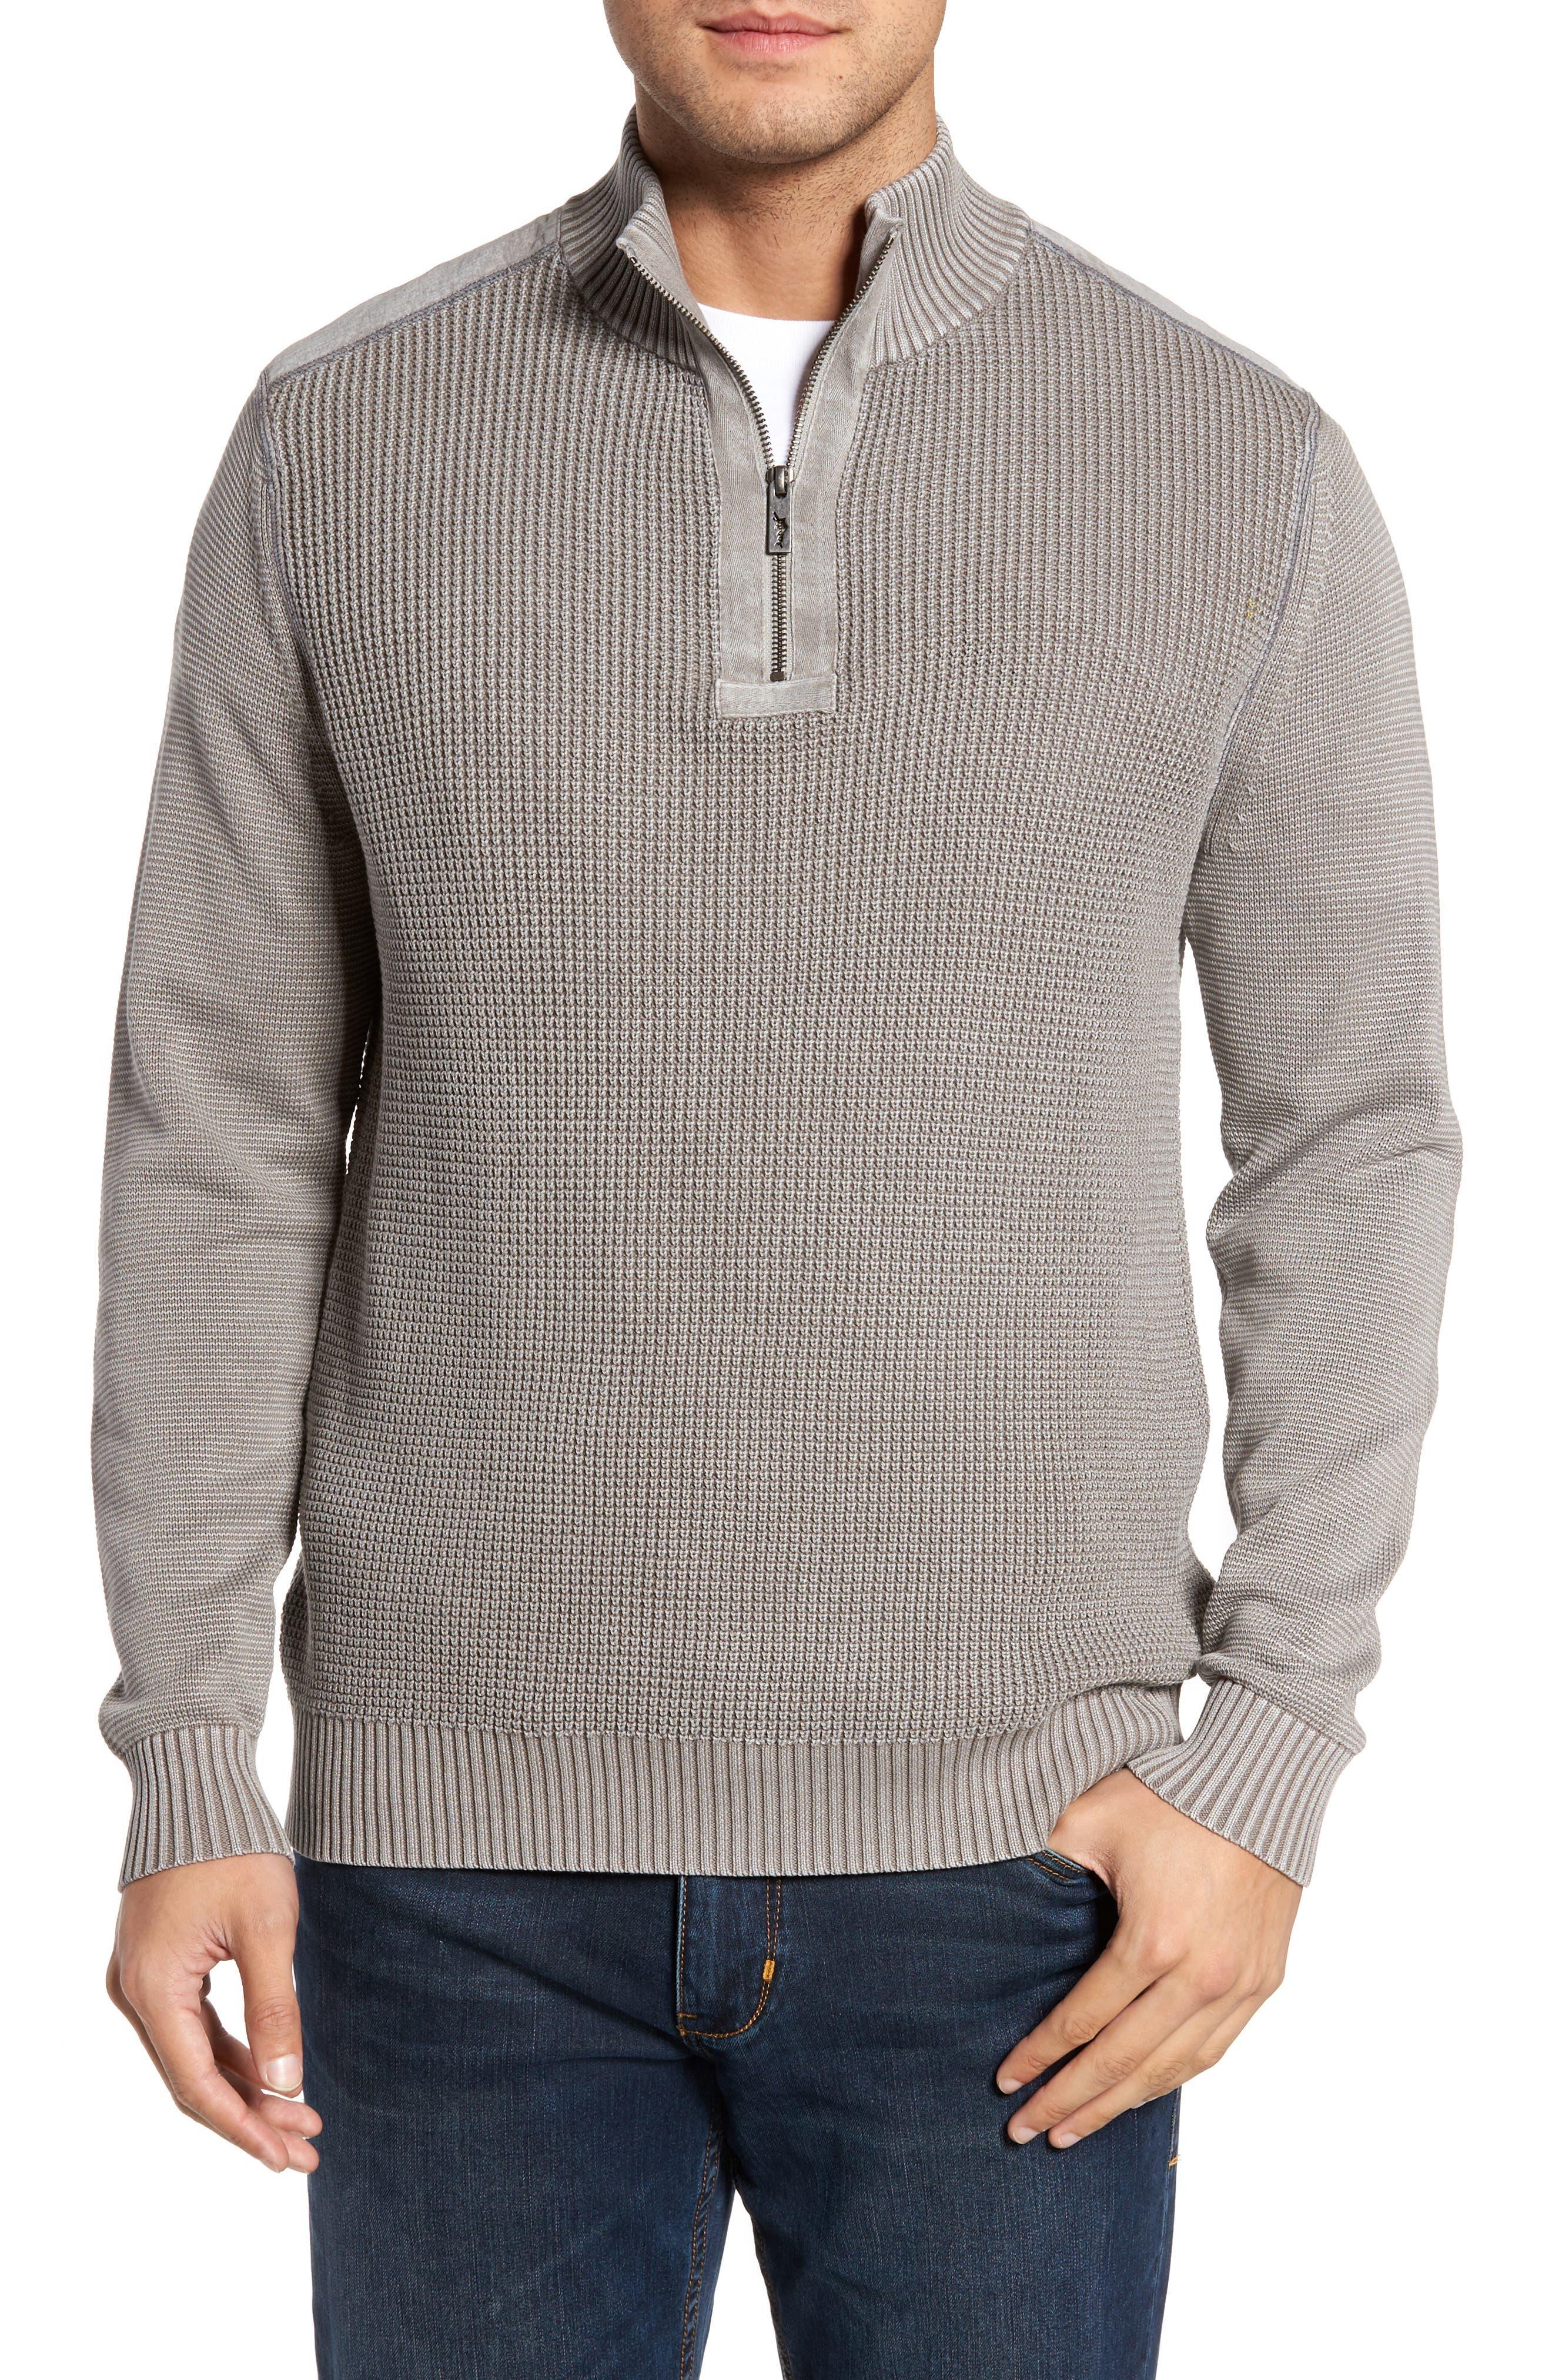 Main Image - Tommy Bahama Coastal Shores Quarter Zip Sweater